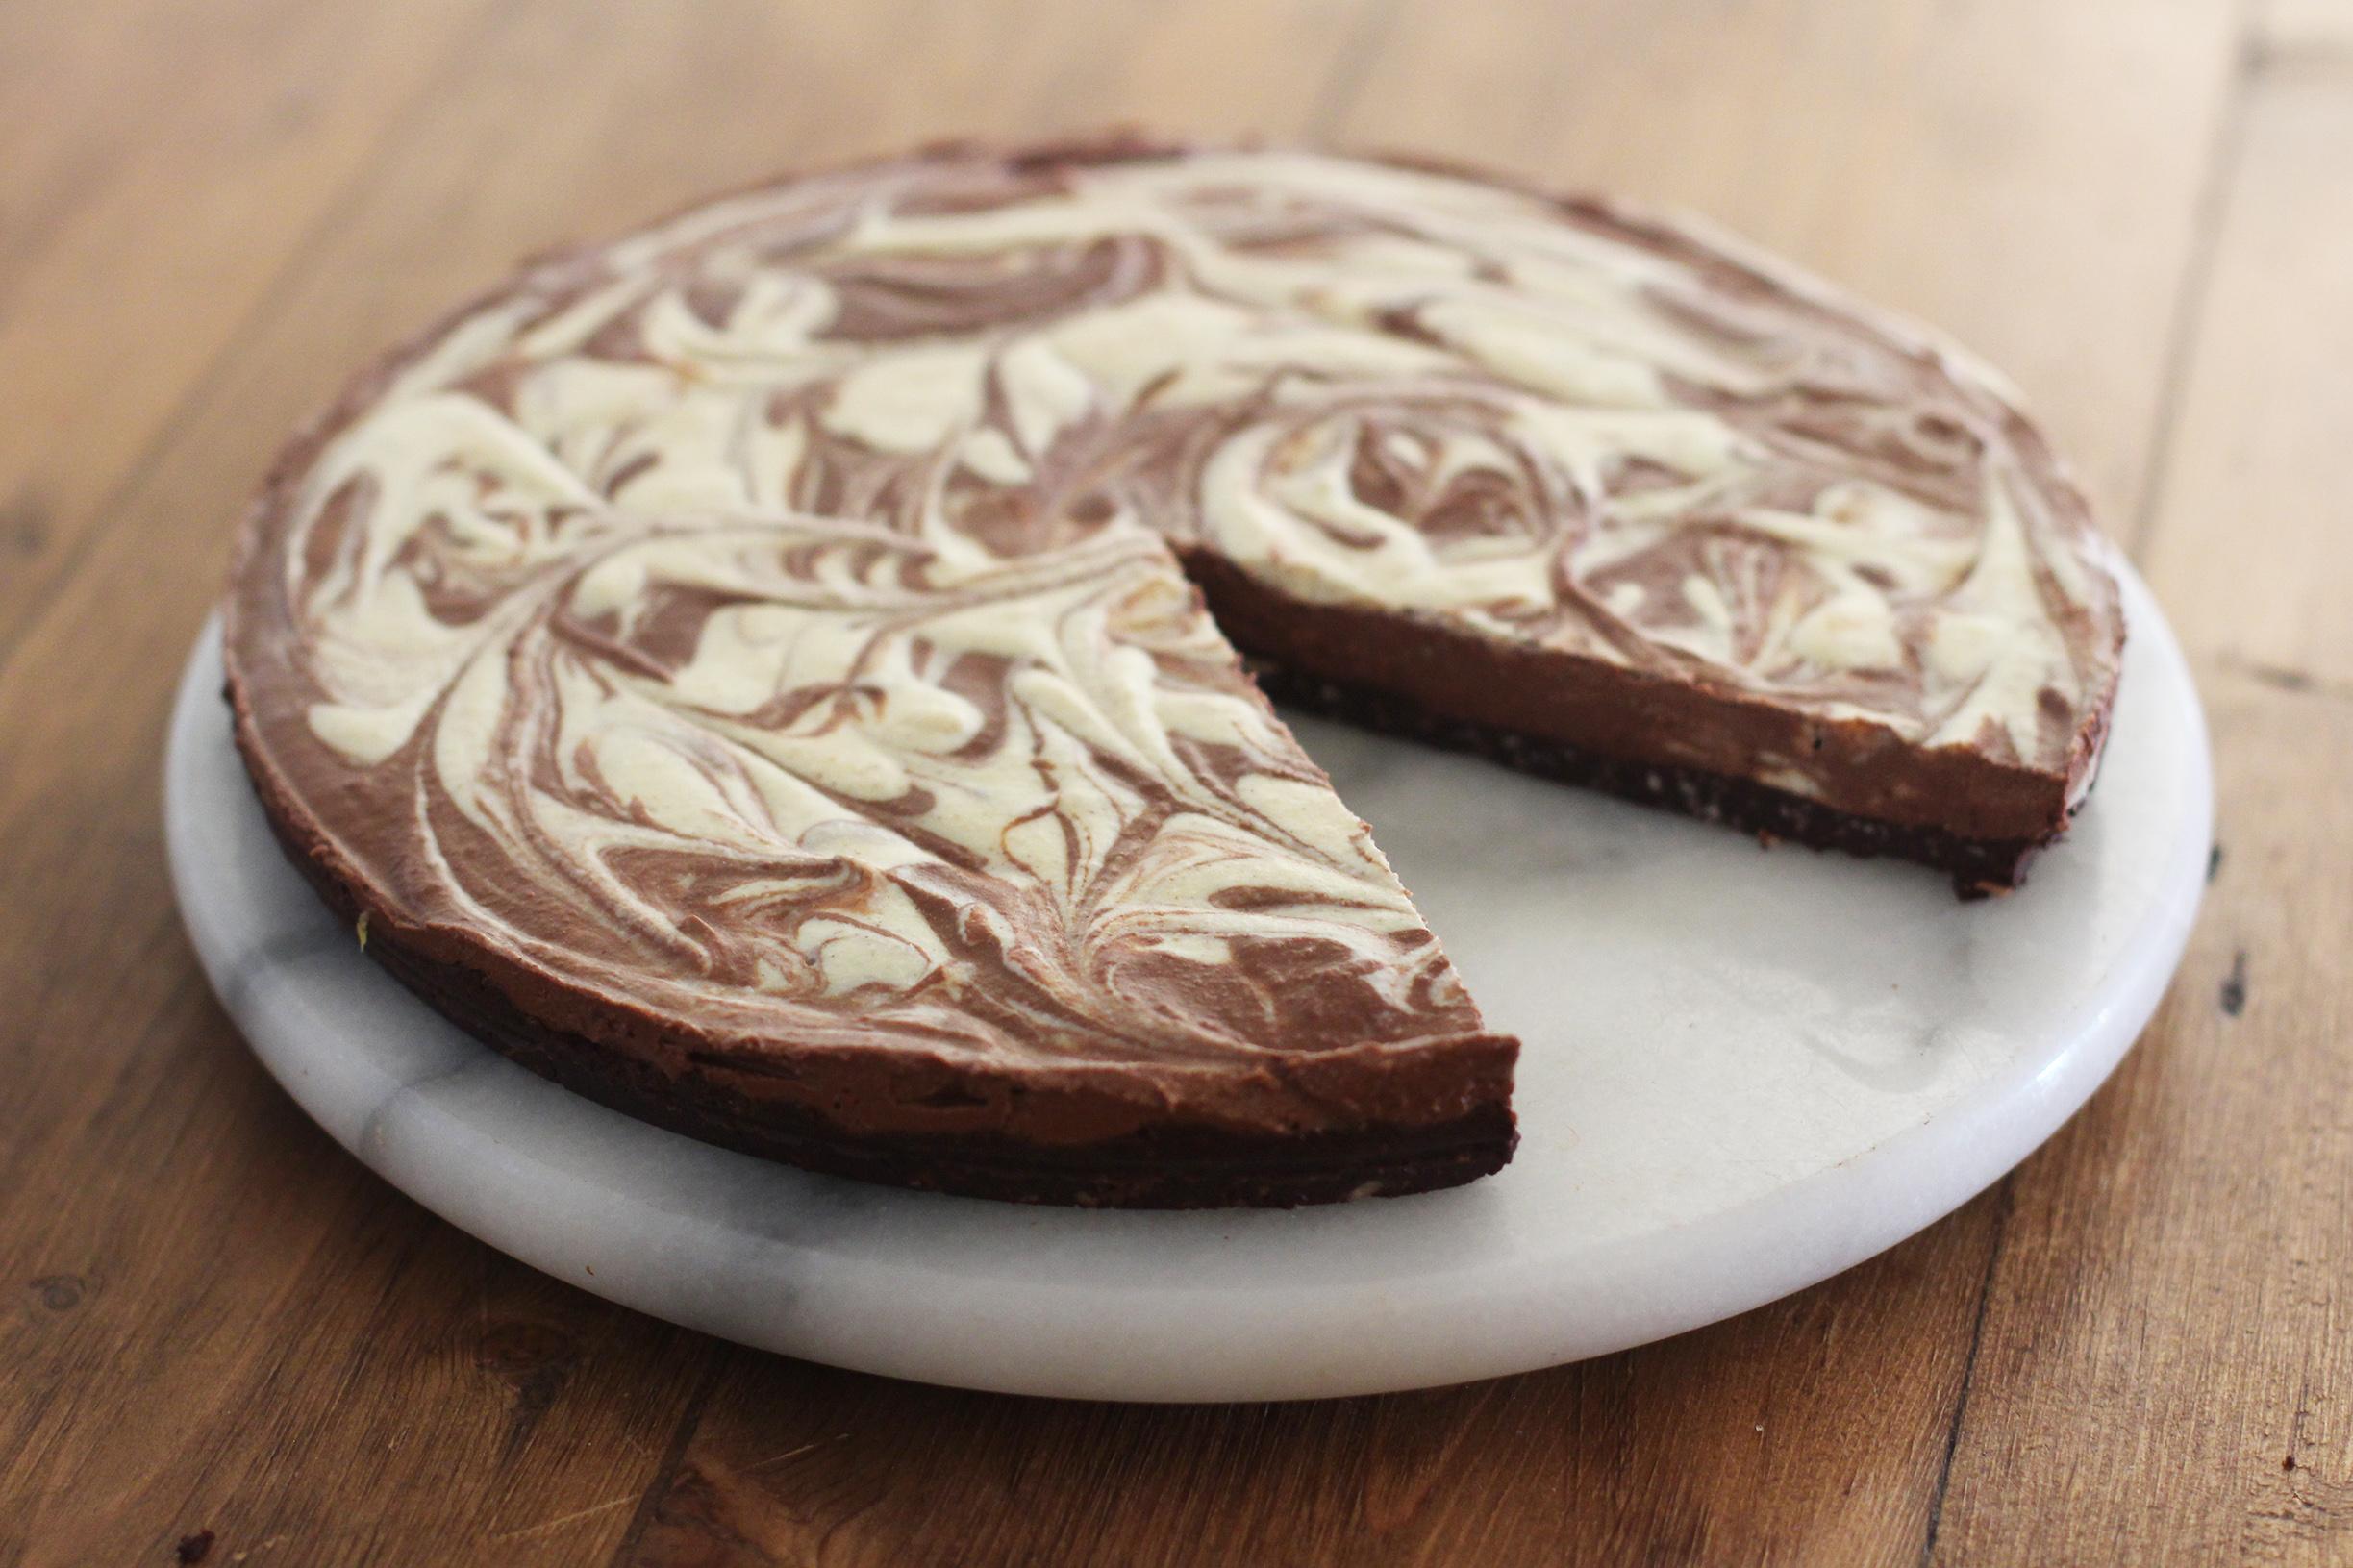 Marbled Chocolate Orange Tart